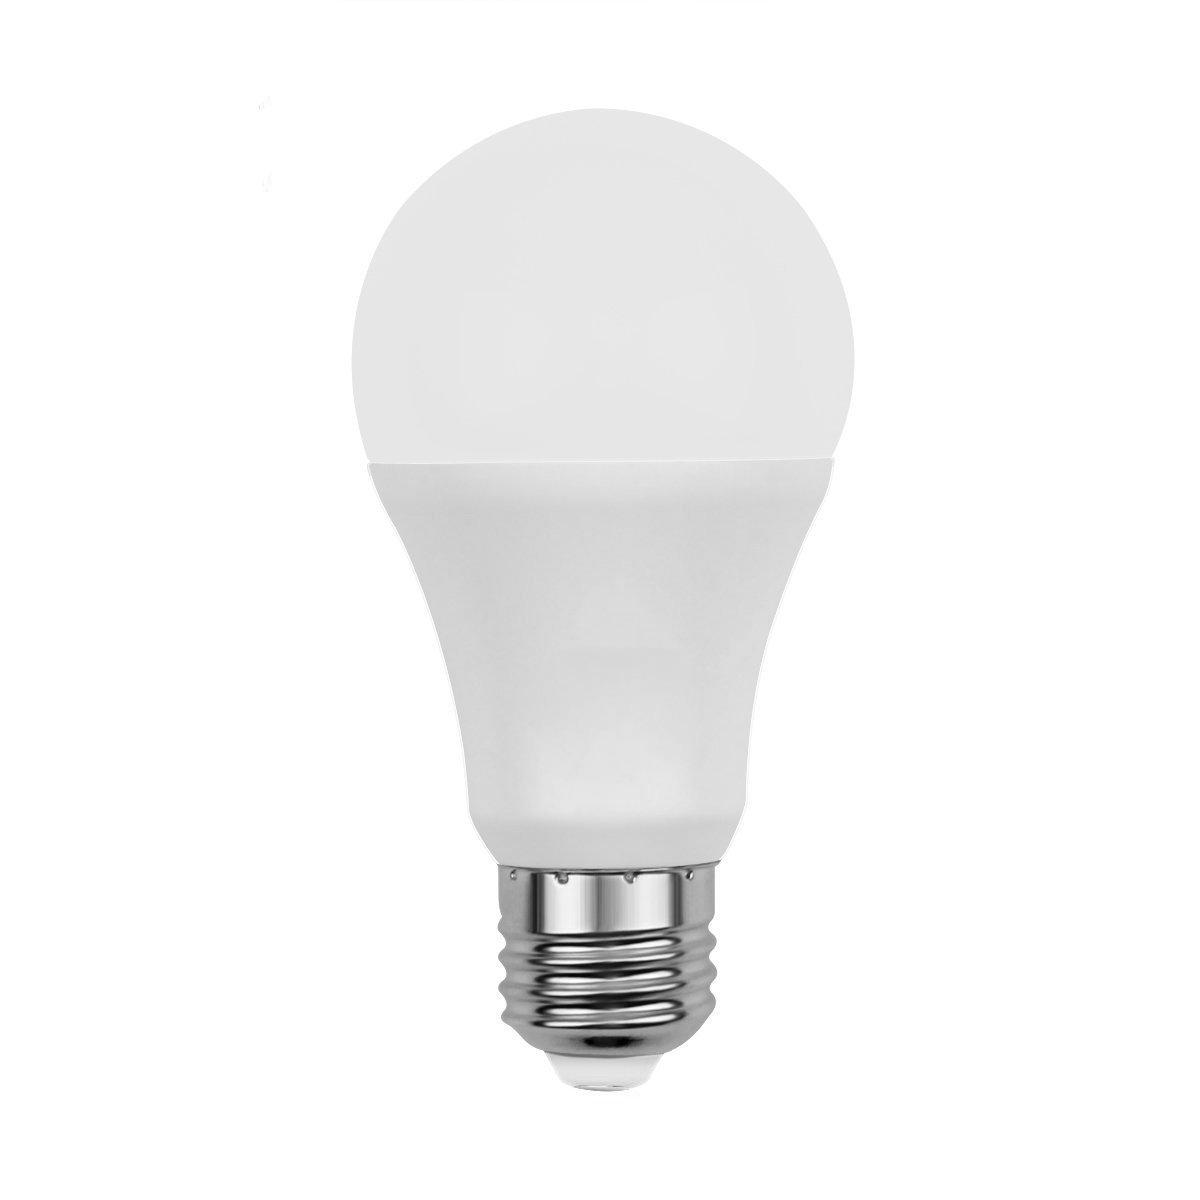 Image Is Loading Dusk To Dawn Led Light Bulb 5w 2700k